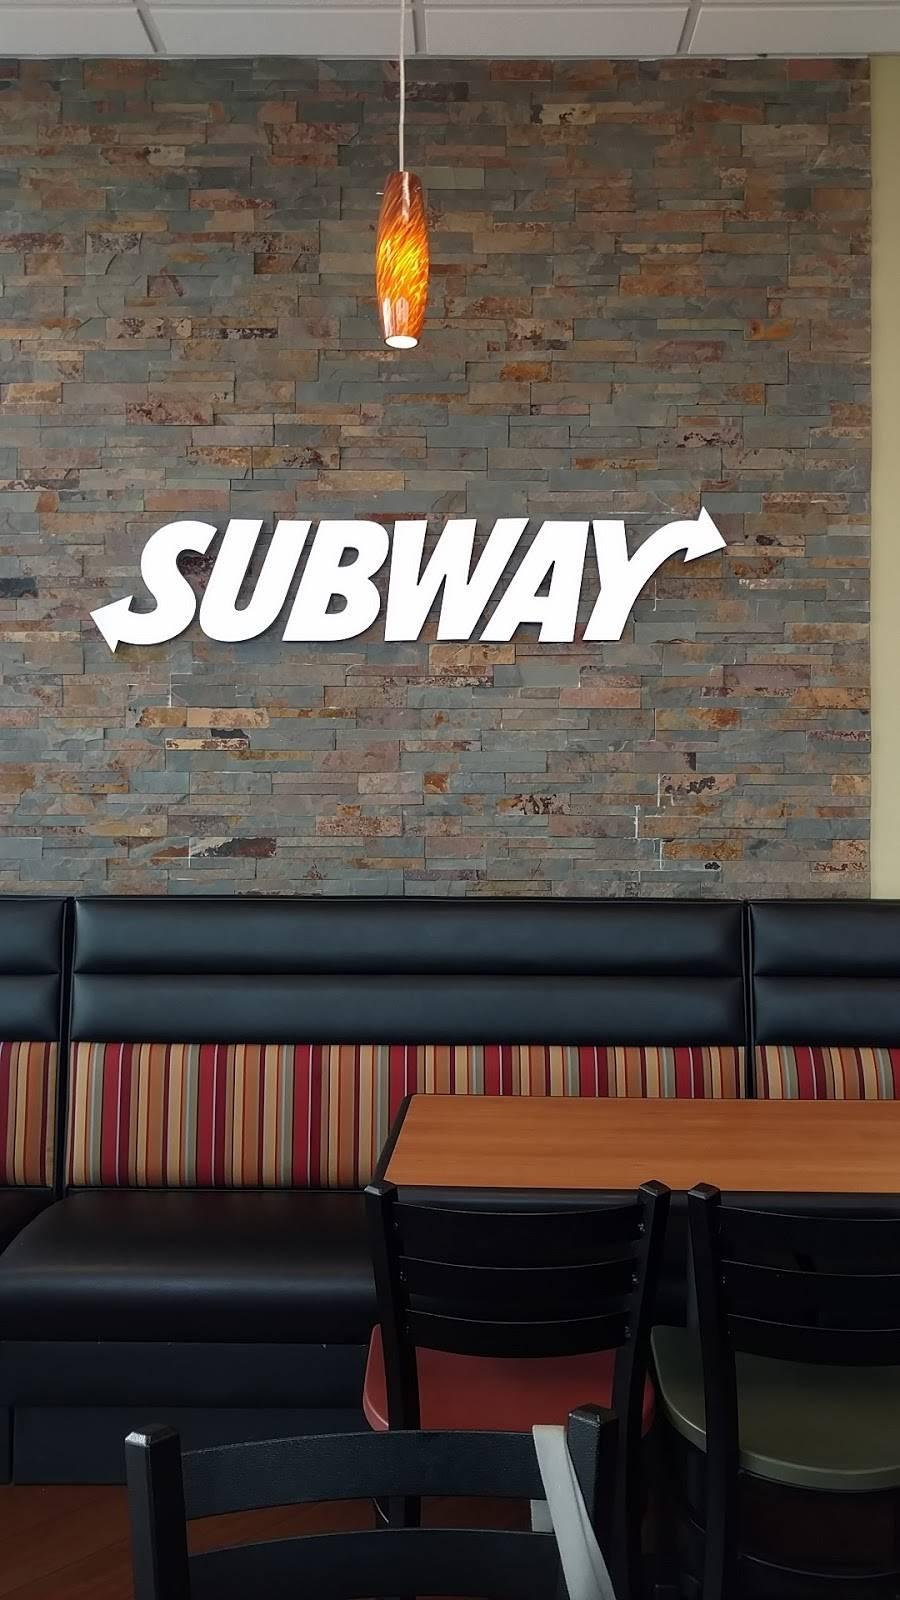 Subway Restaurants | restaurant | 5310 E Bay Dr #300, Clearwater, FL 33764, USA | 7275352974 OR +1 727-535-2974